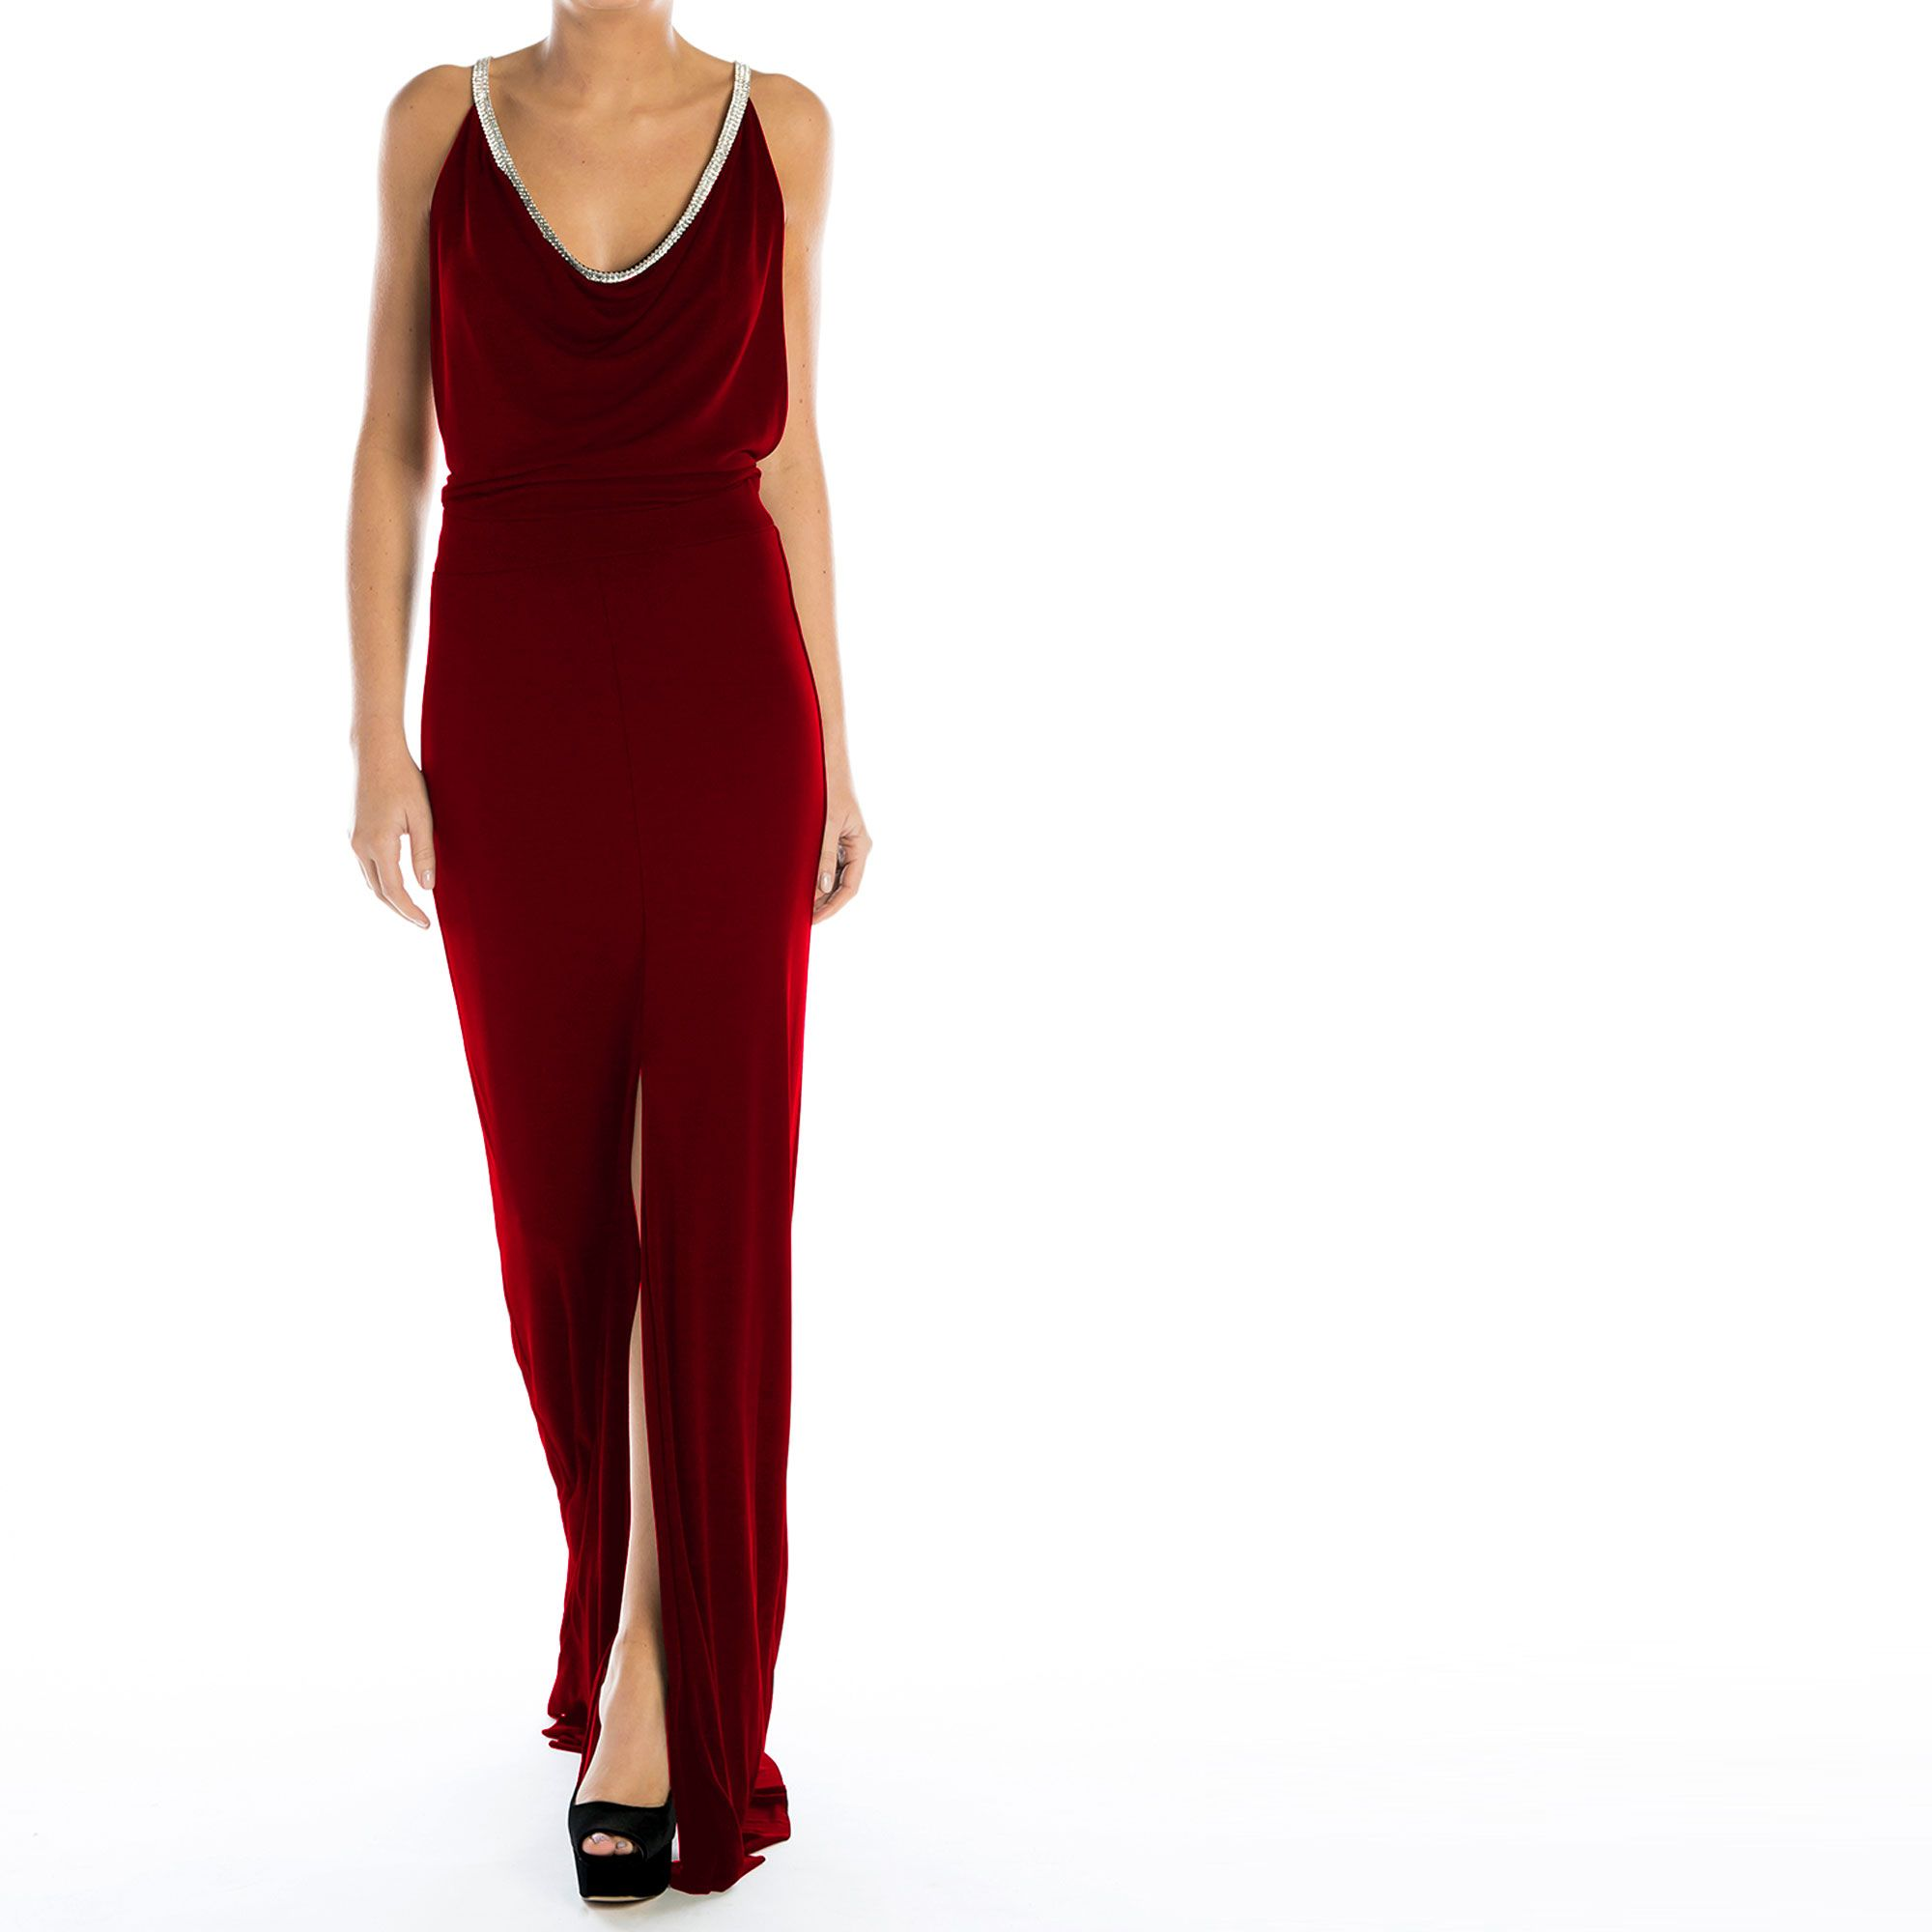 High Society Gown, low cut back, jewel tones, swarovski detailing